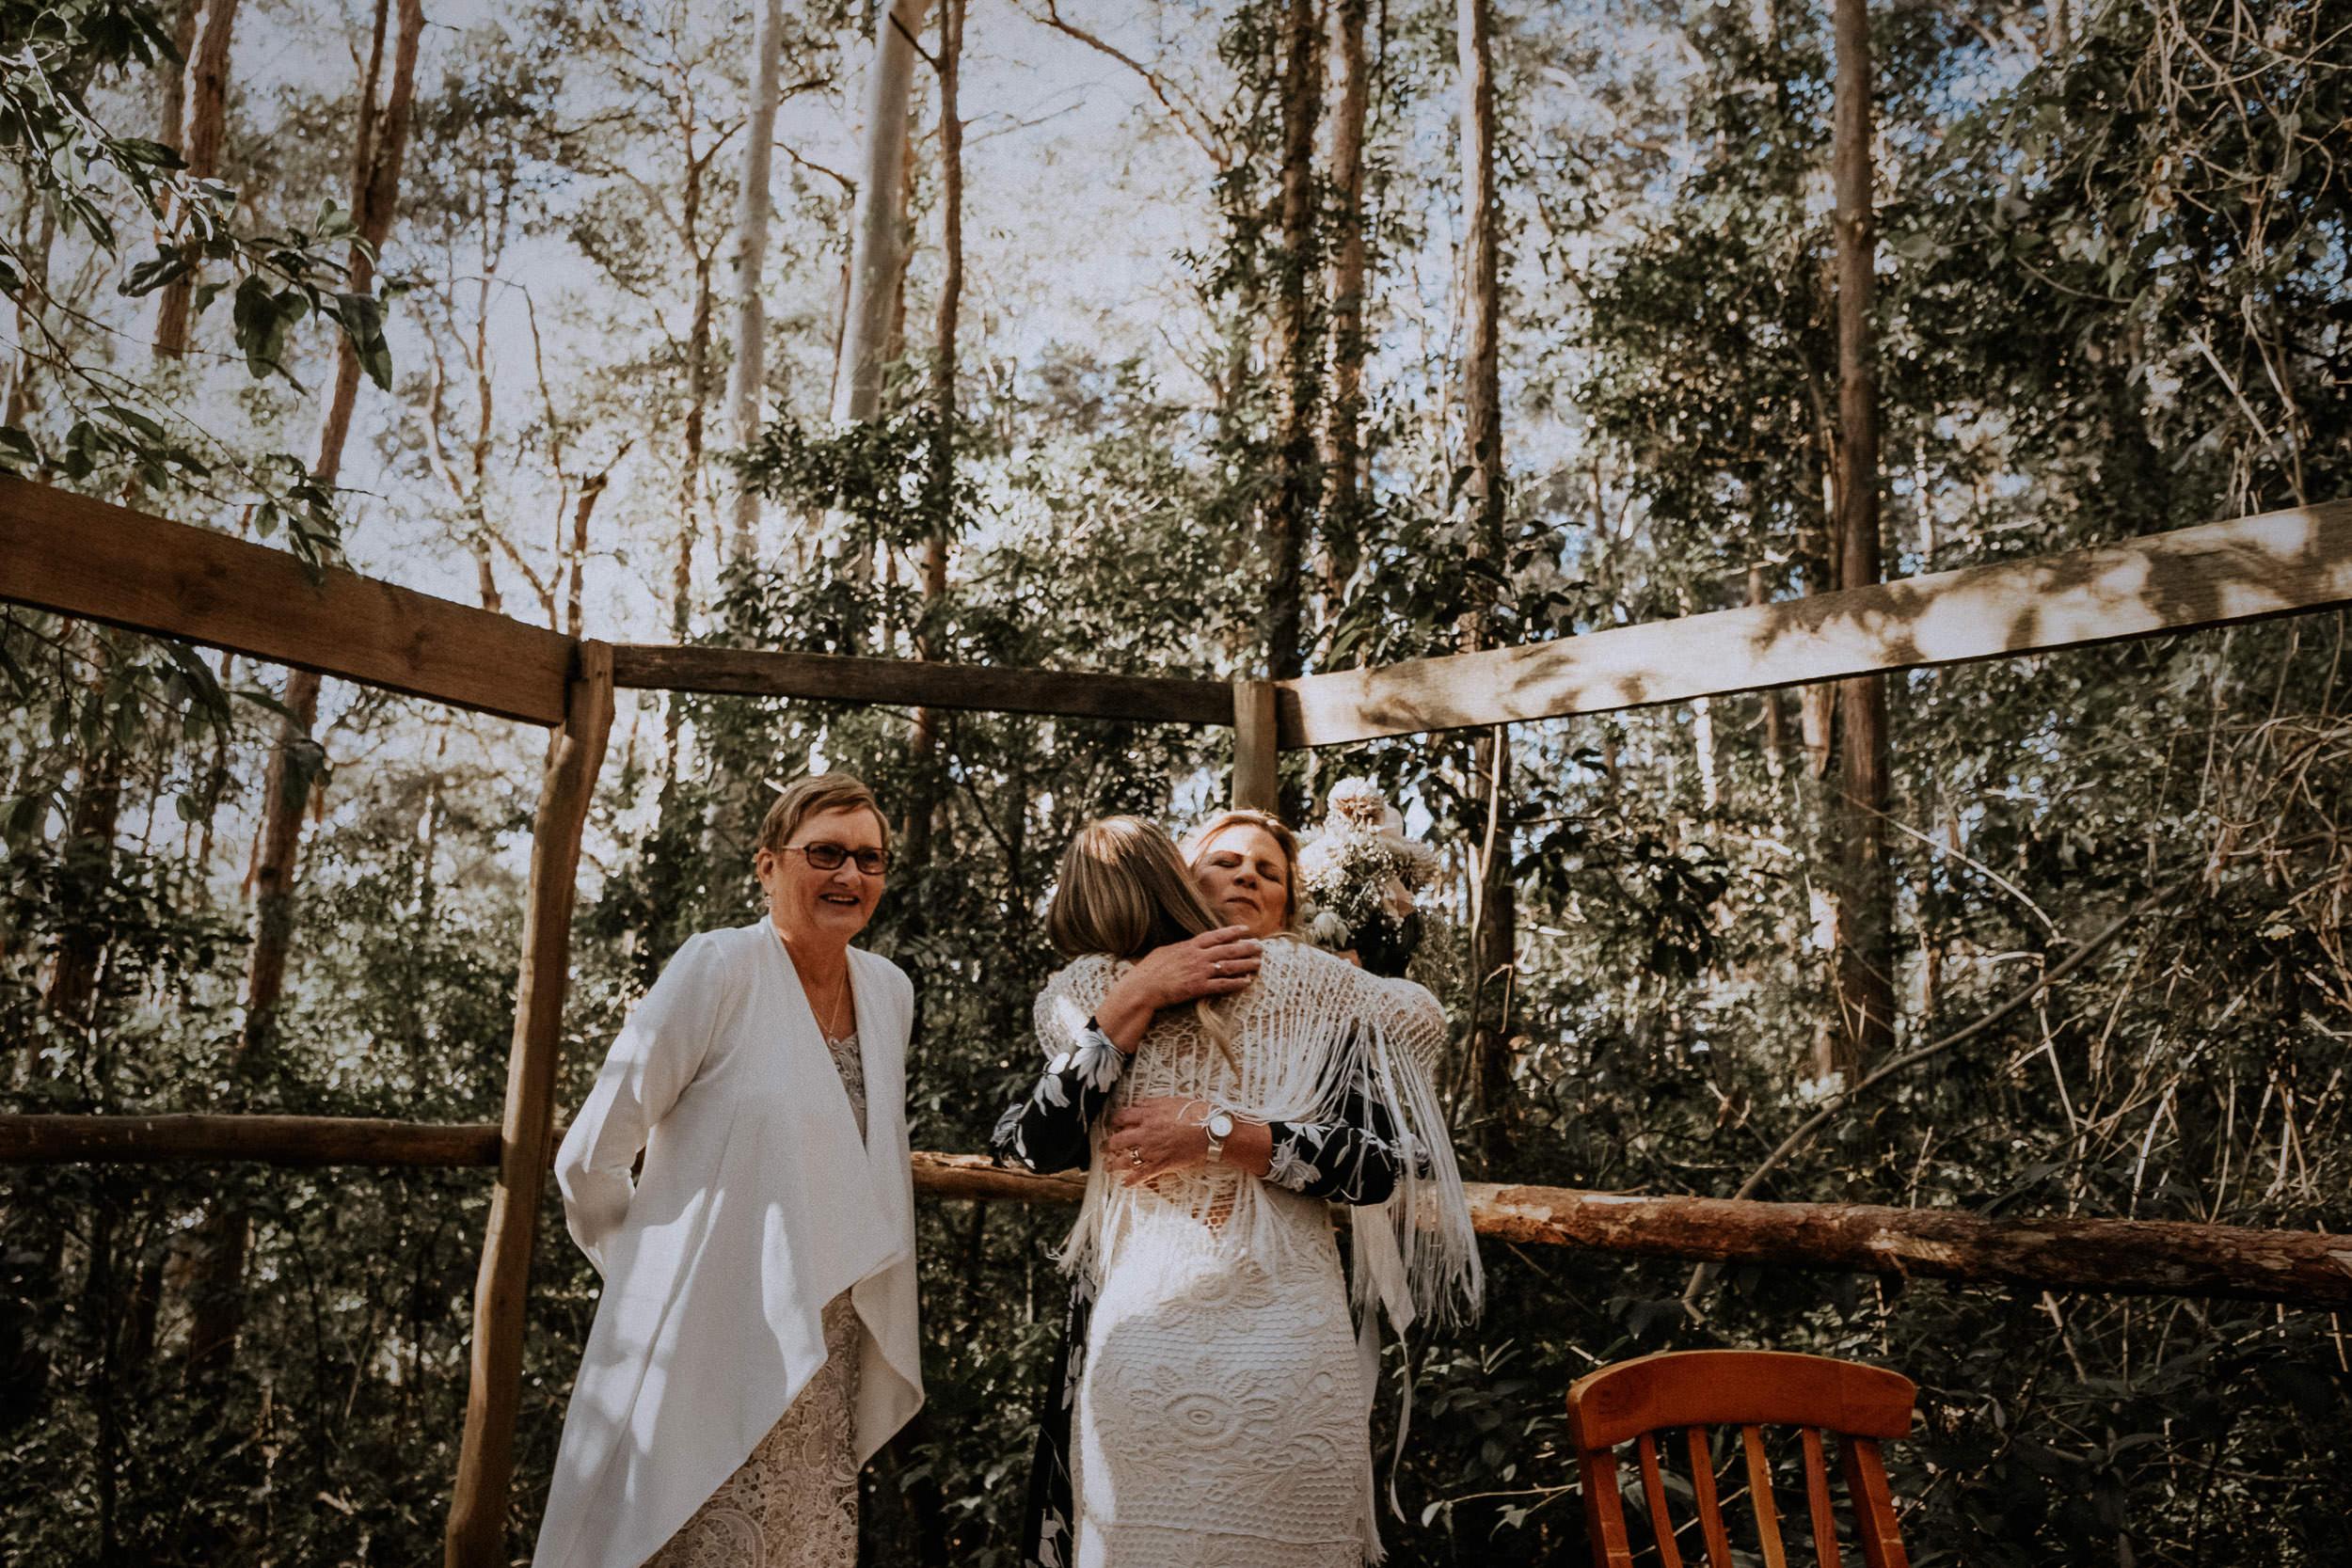 S&A Elopement - Kings & Thieves - Shred 'Til Dead - Central Coast Beach Forest Wedding - 274.jpg